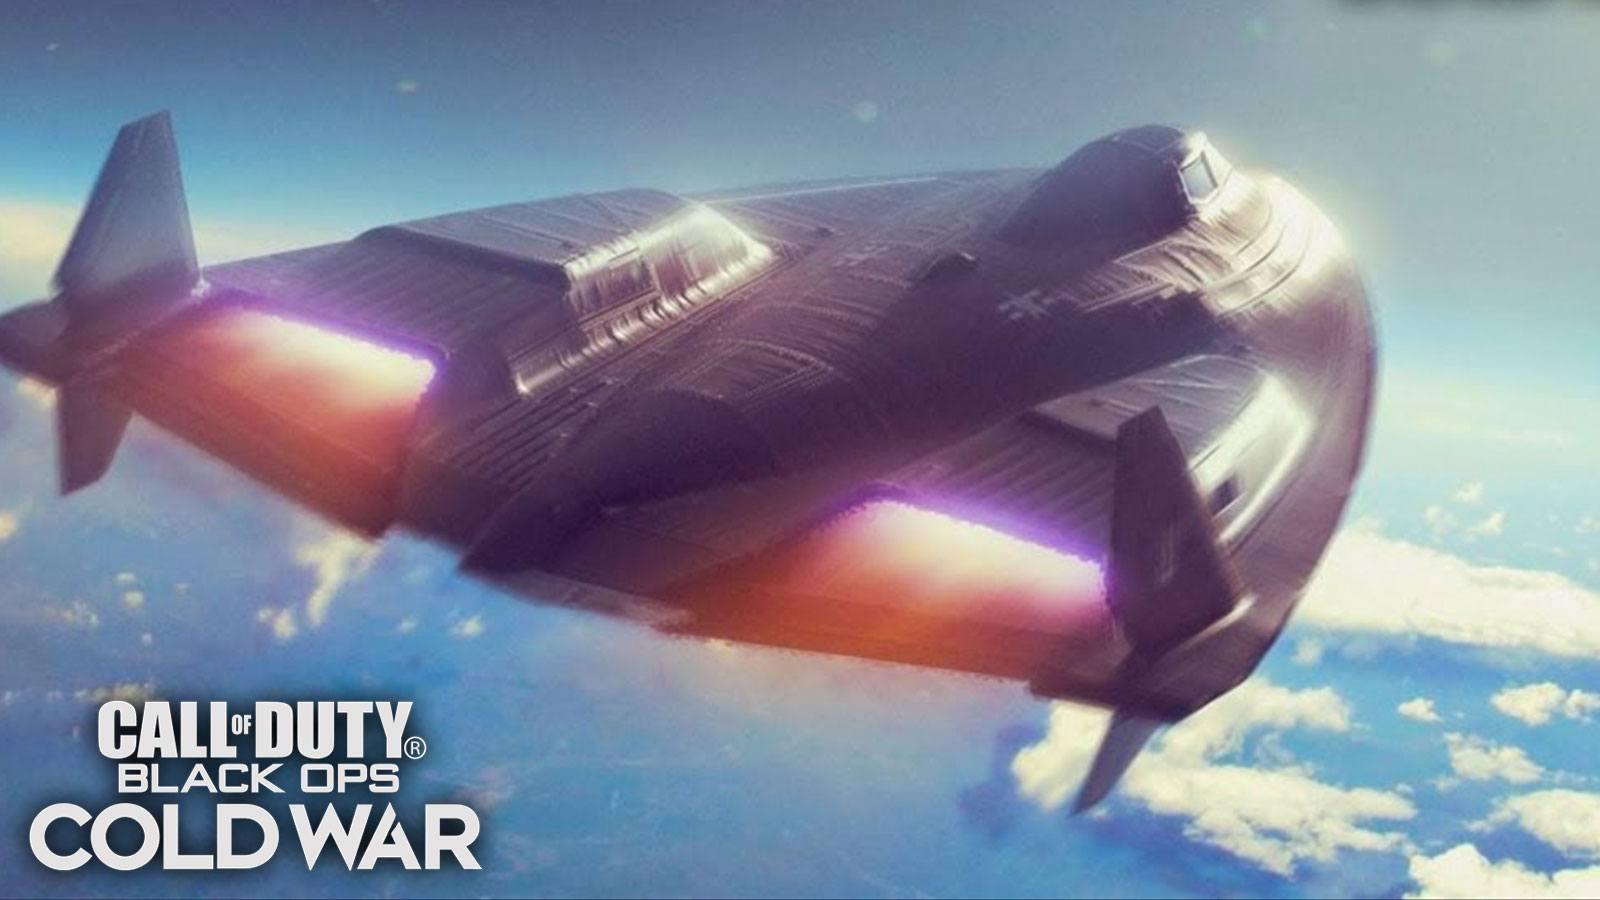 HARP Black Ops Cold War Activision